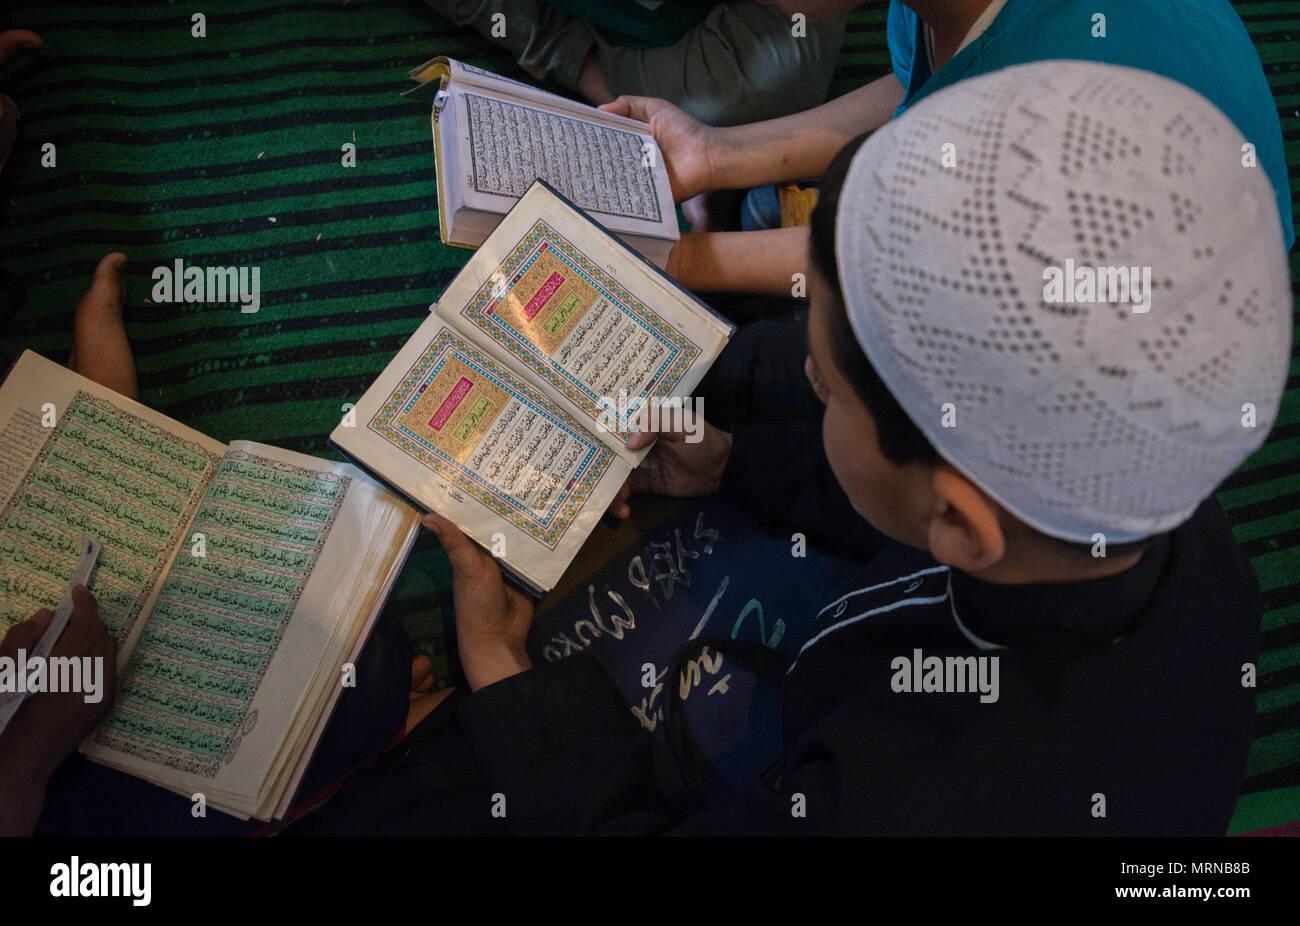 Bargah In Srinagar The Summer Capital Of Indian Administered Kashmir Ramadan Is Ninth Month Islamic According To Muslim Calendar